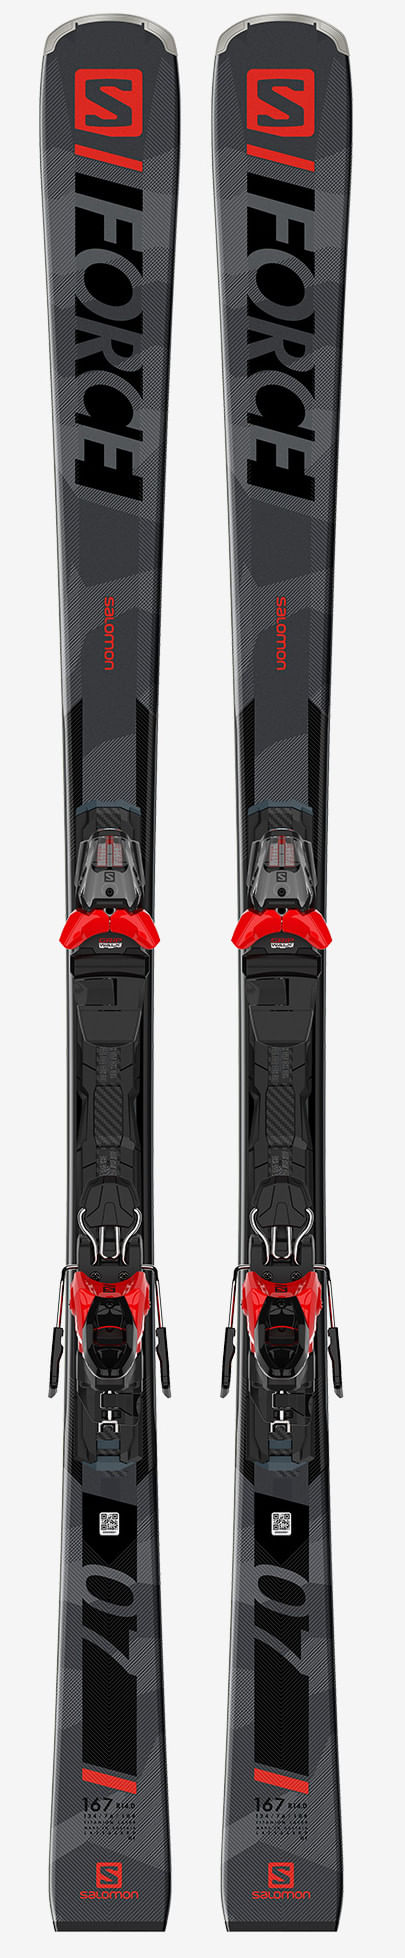 Salomon-S-Force-7-Skis-With-M11-GW-Bindings-2021